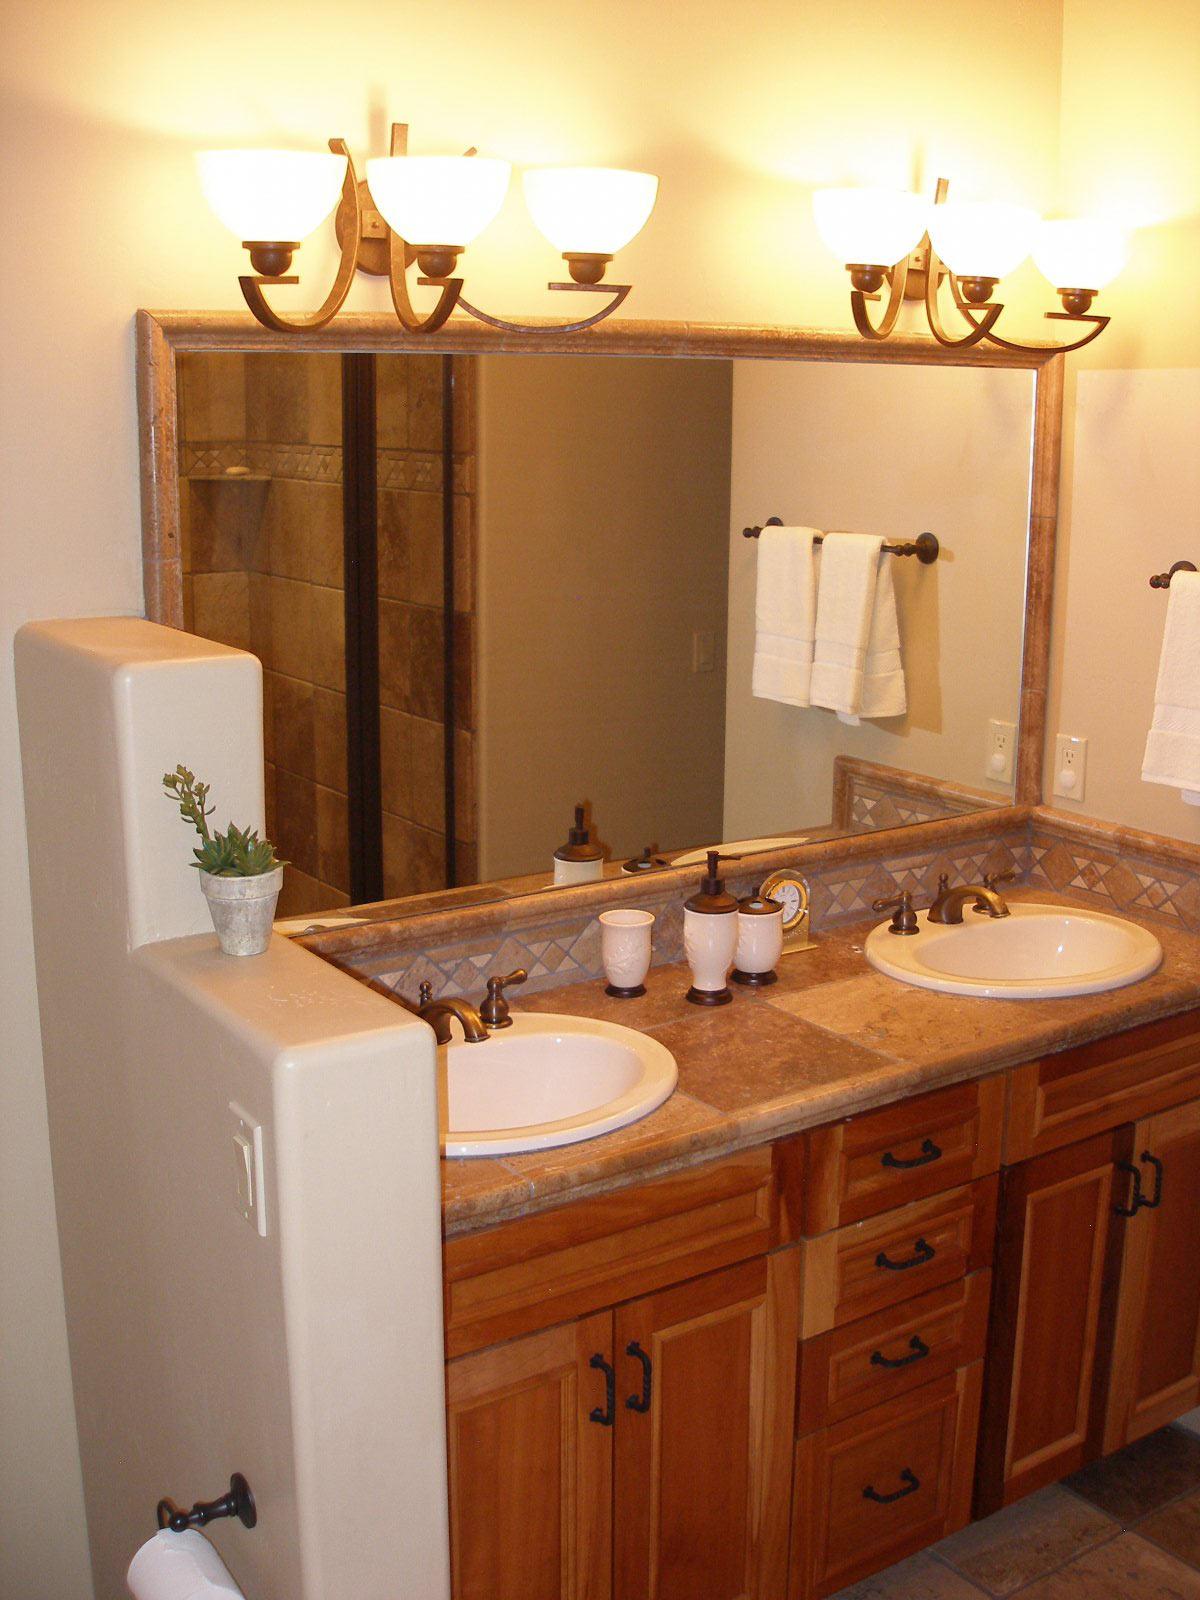 Javelina Haven Amenities Vacation Rental House in Sedona Arizona